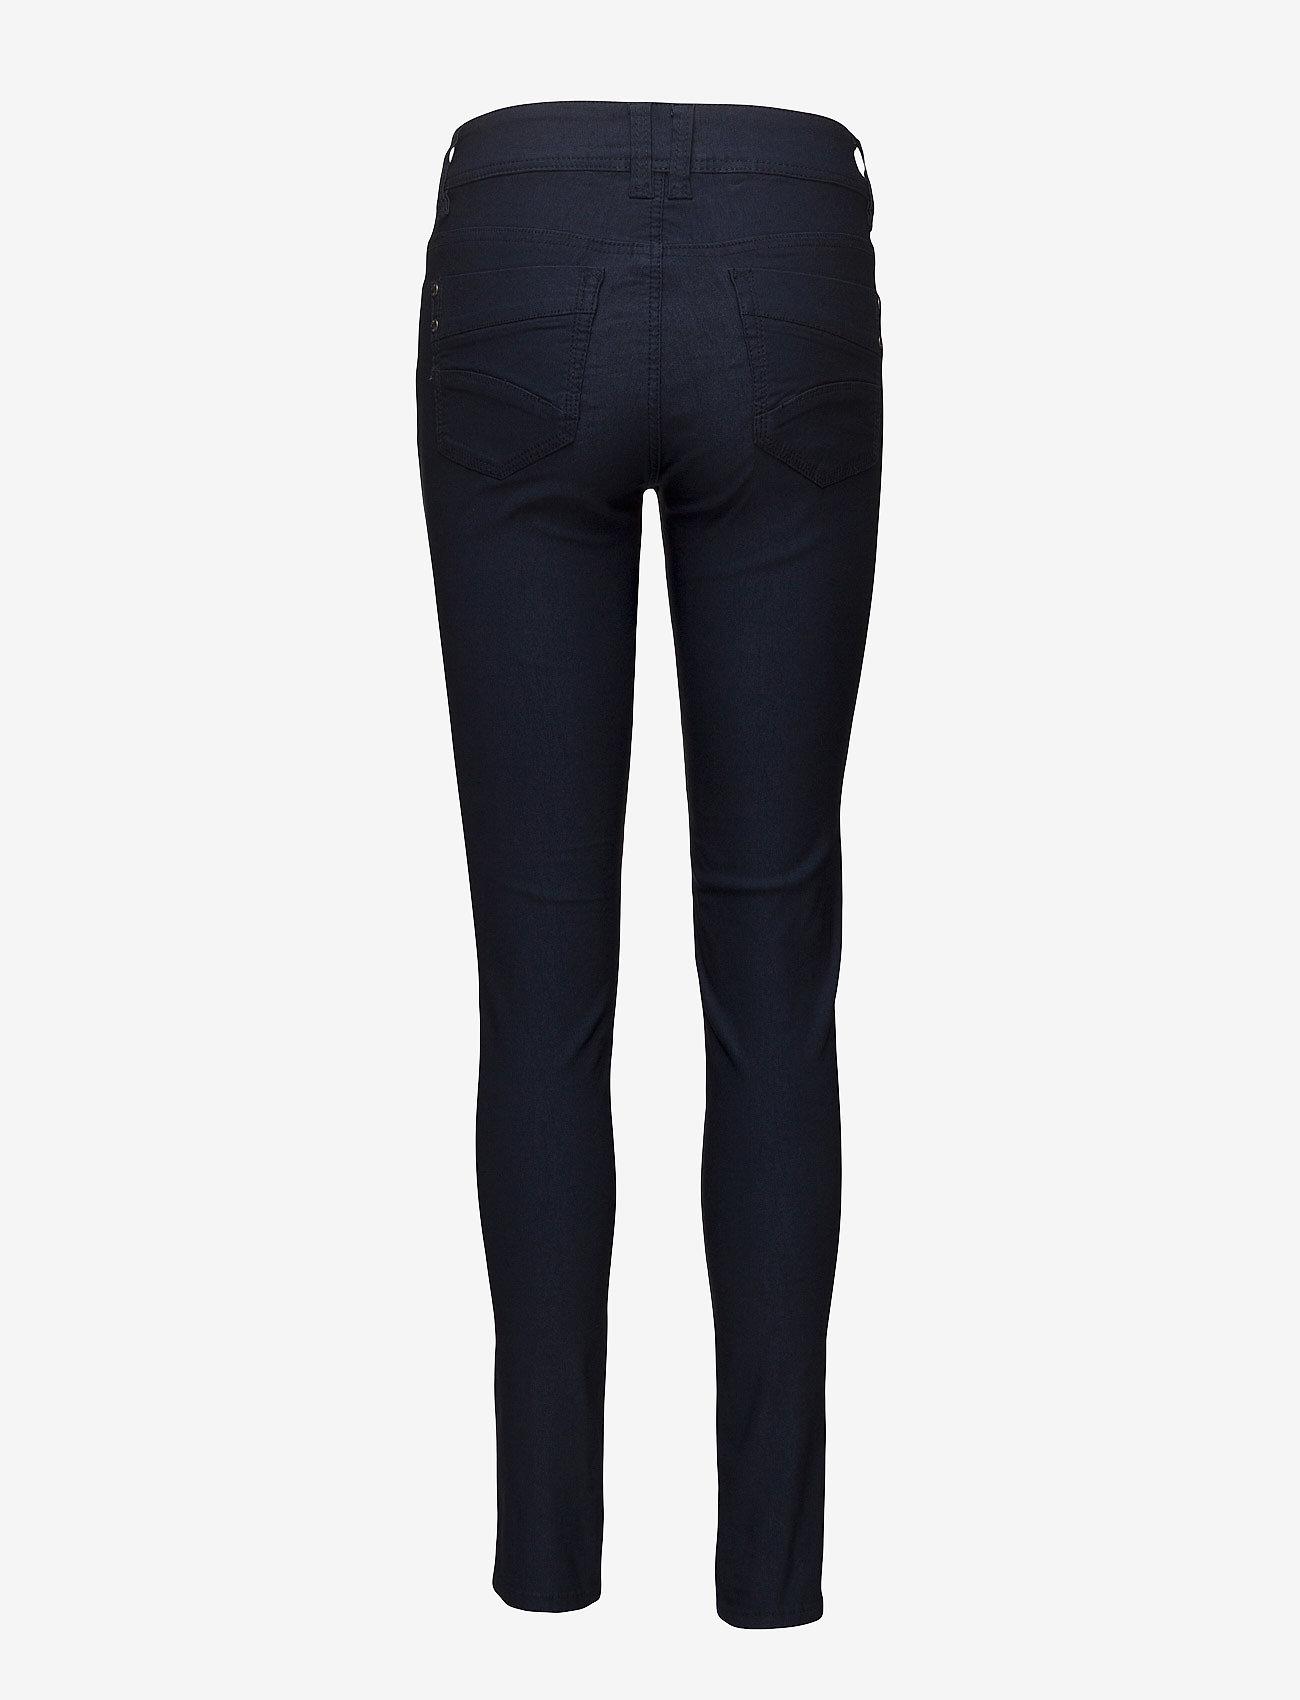 Fransa - Zalin 1 Pant - trousers with skinny legs - dark peacoat - 1